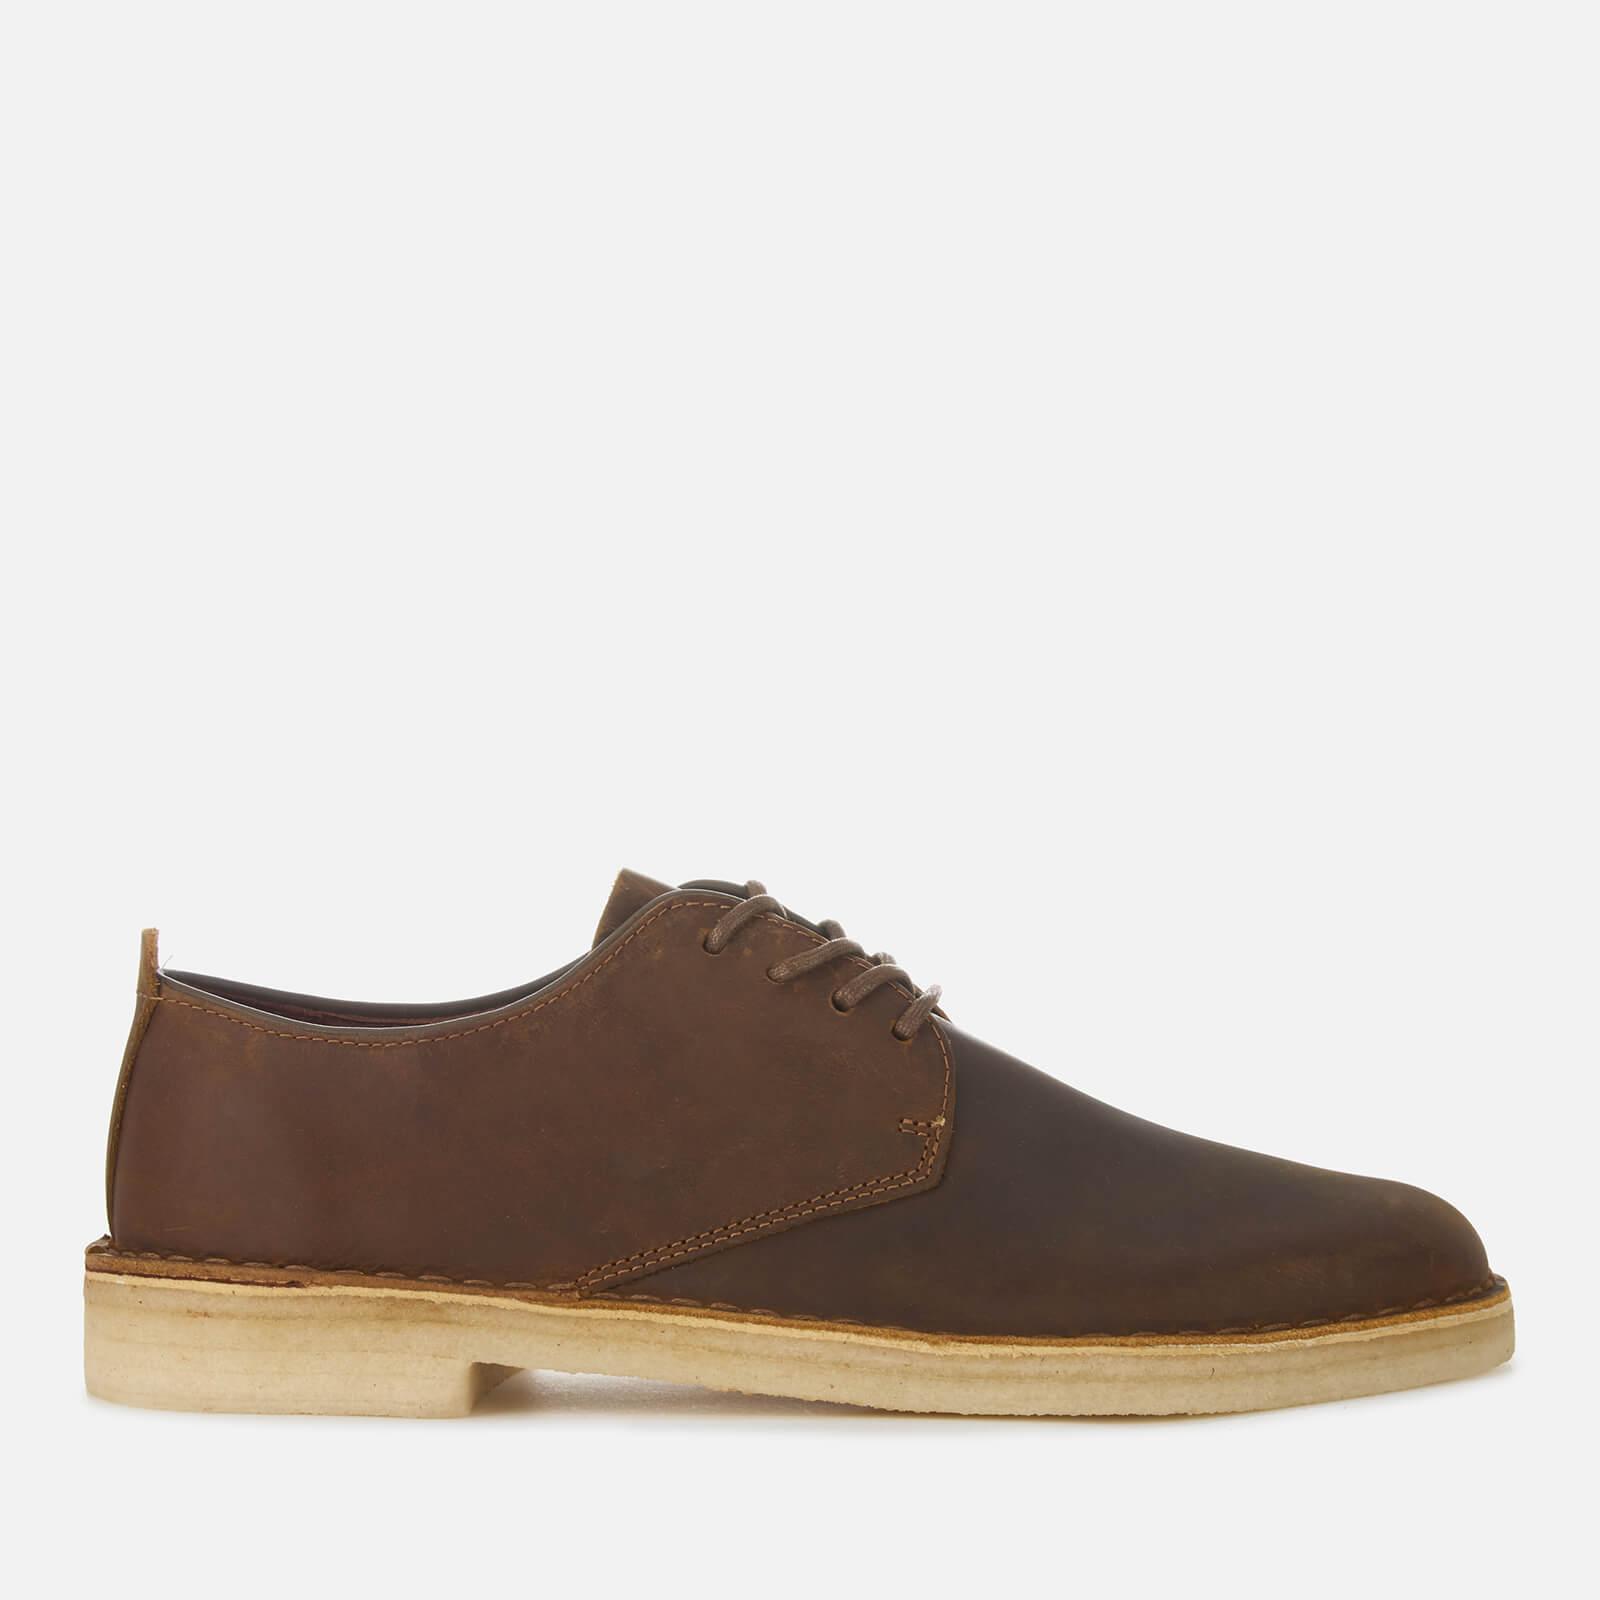 Clarks Originals Men's Desert London Leather Derby Shoes - Beeswax - UK 7